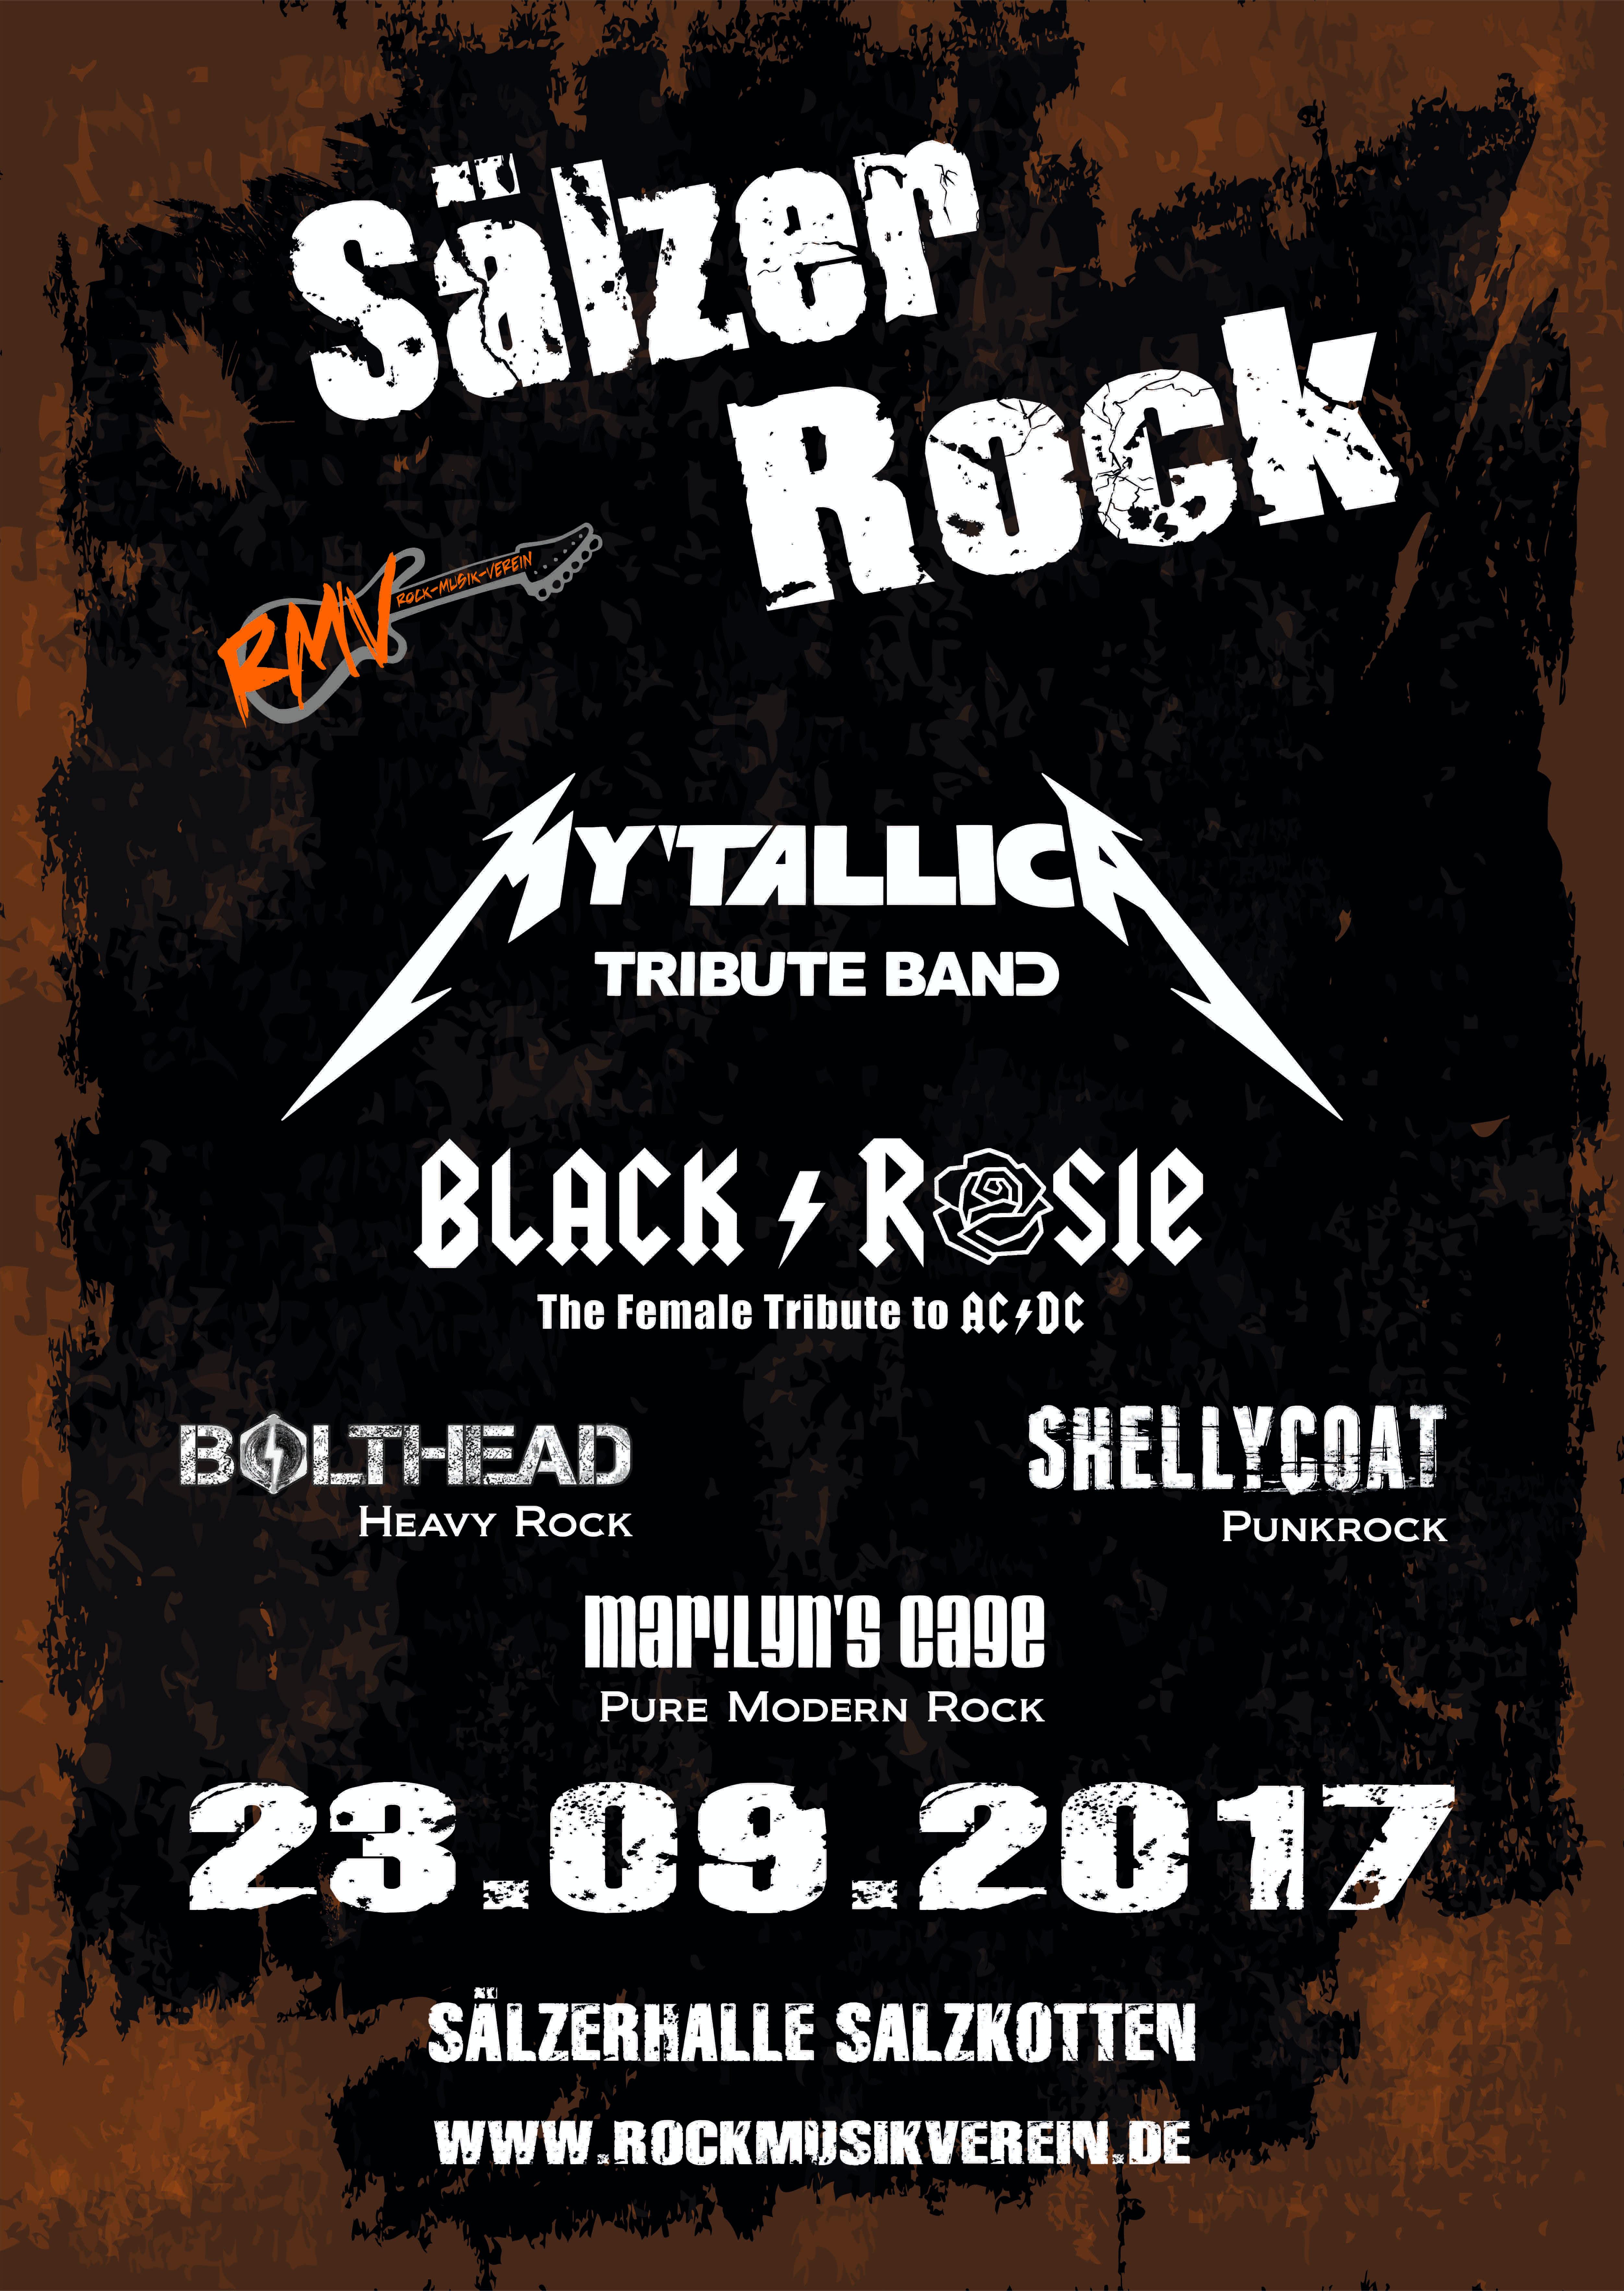 Metallica-Coverband-Tribute-Band-MYTALLICA-2017-Tour-Deutschland-Sälzer-Rocknacht-Salzkotten